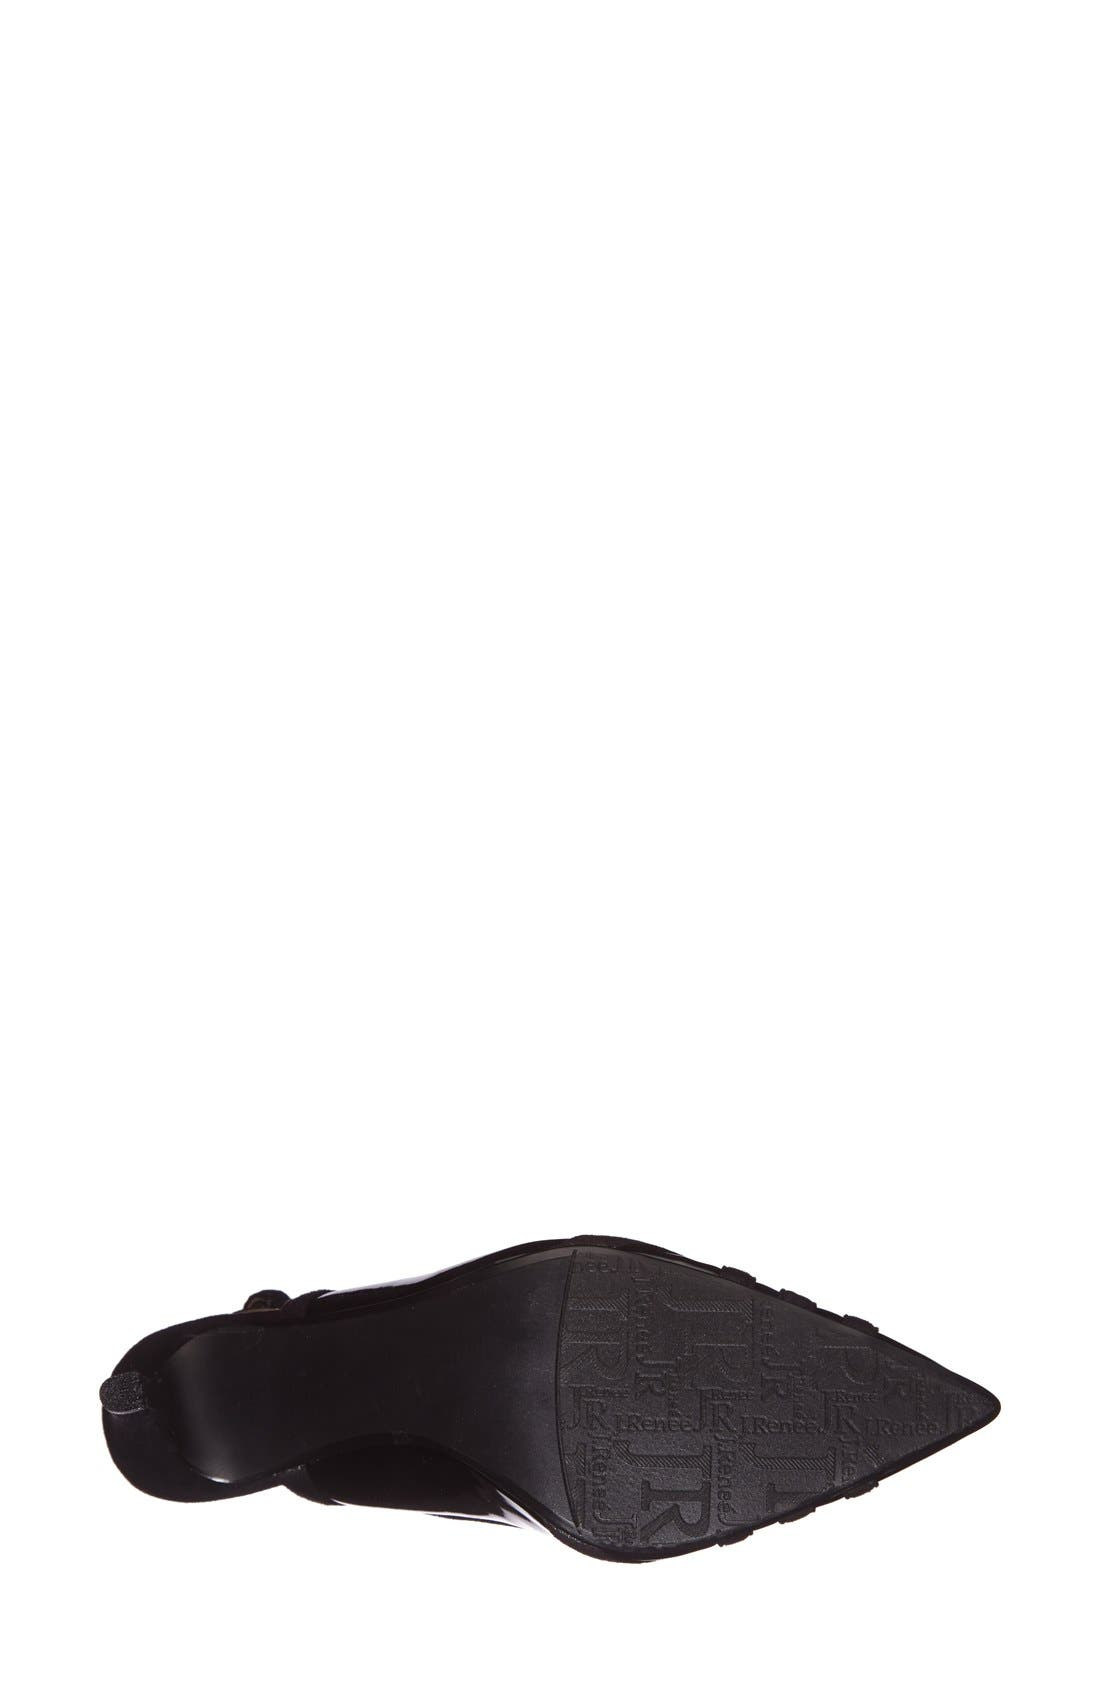 J. RENEÉ,                             'Cierra' Slingback Pump,                             Alternate thumbnail 3, color,                             001